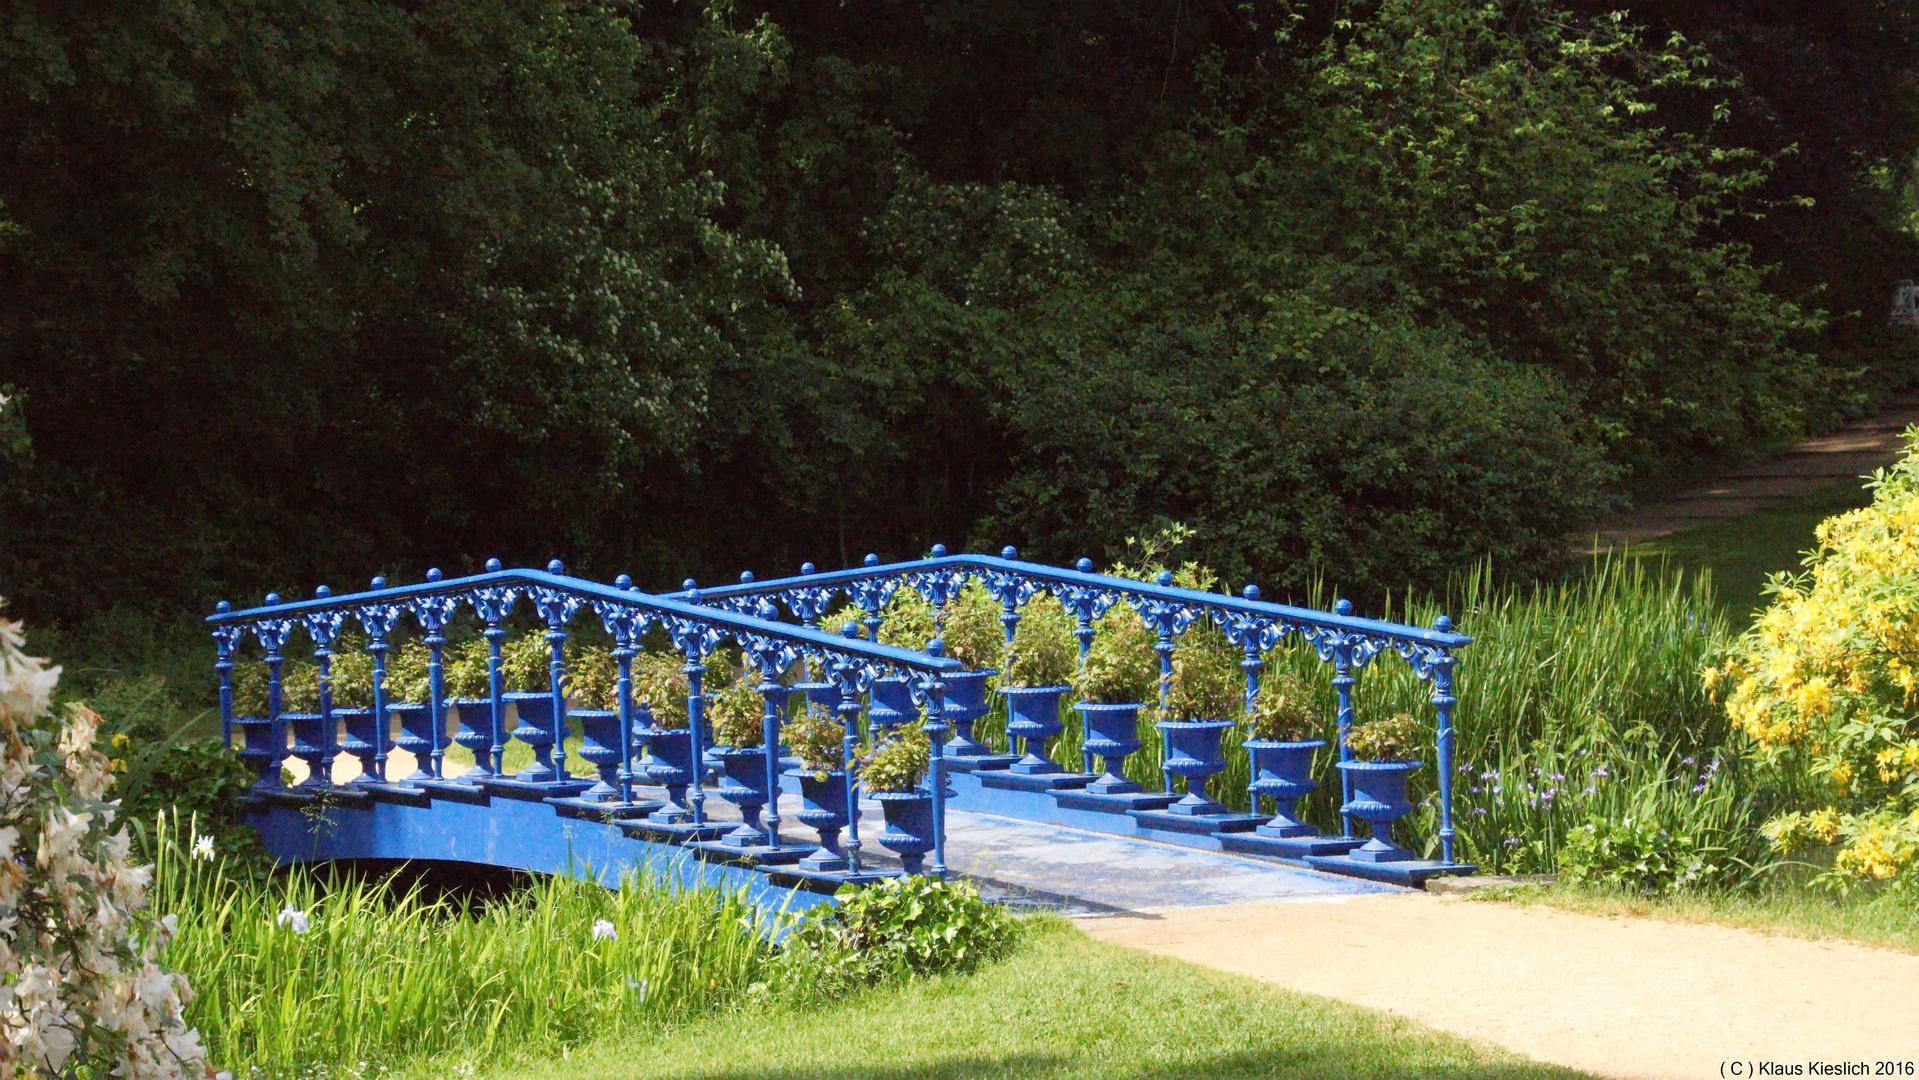 Blaue Brücke im Fürst-Pückler-Park Bad Muskau